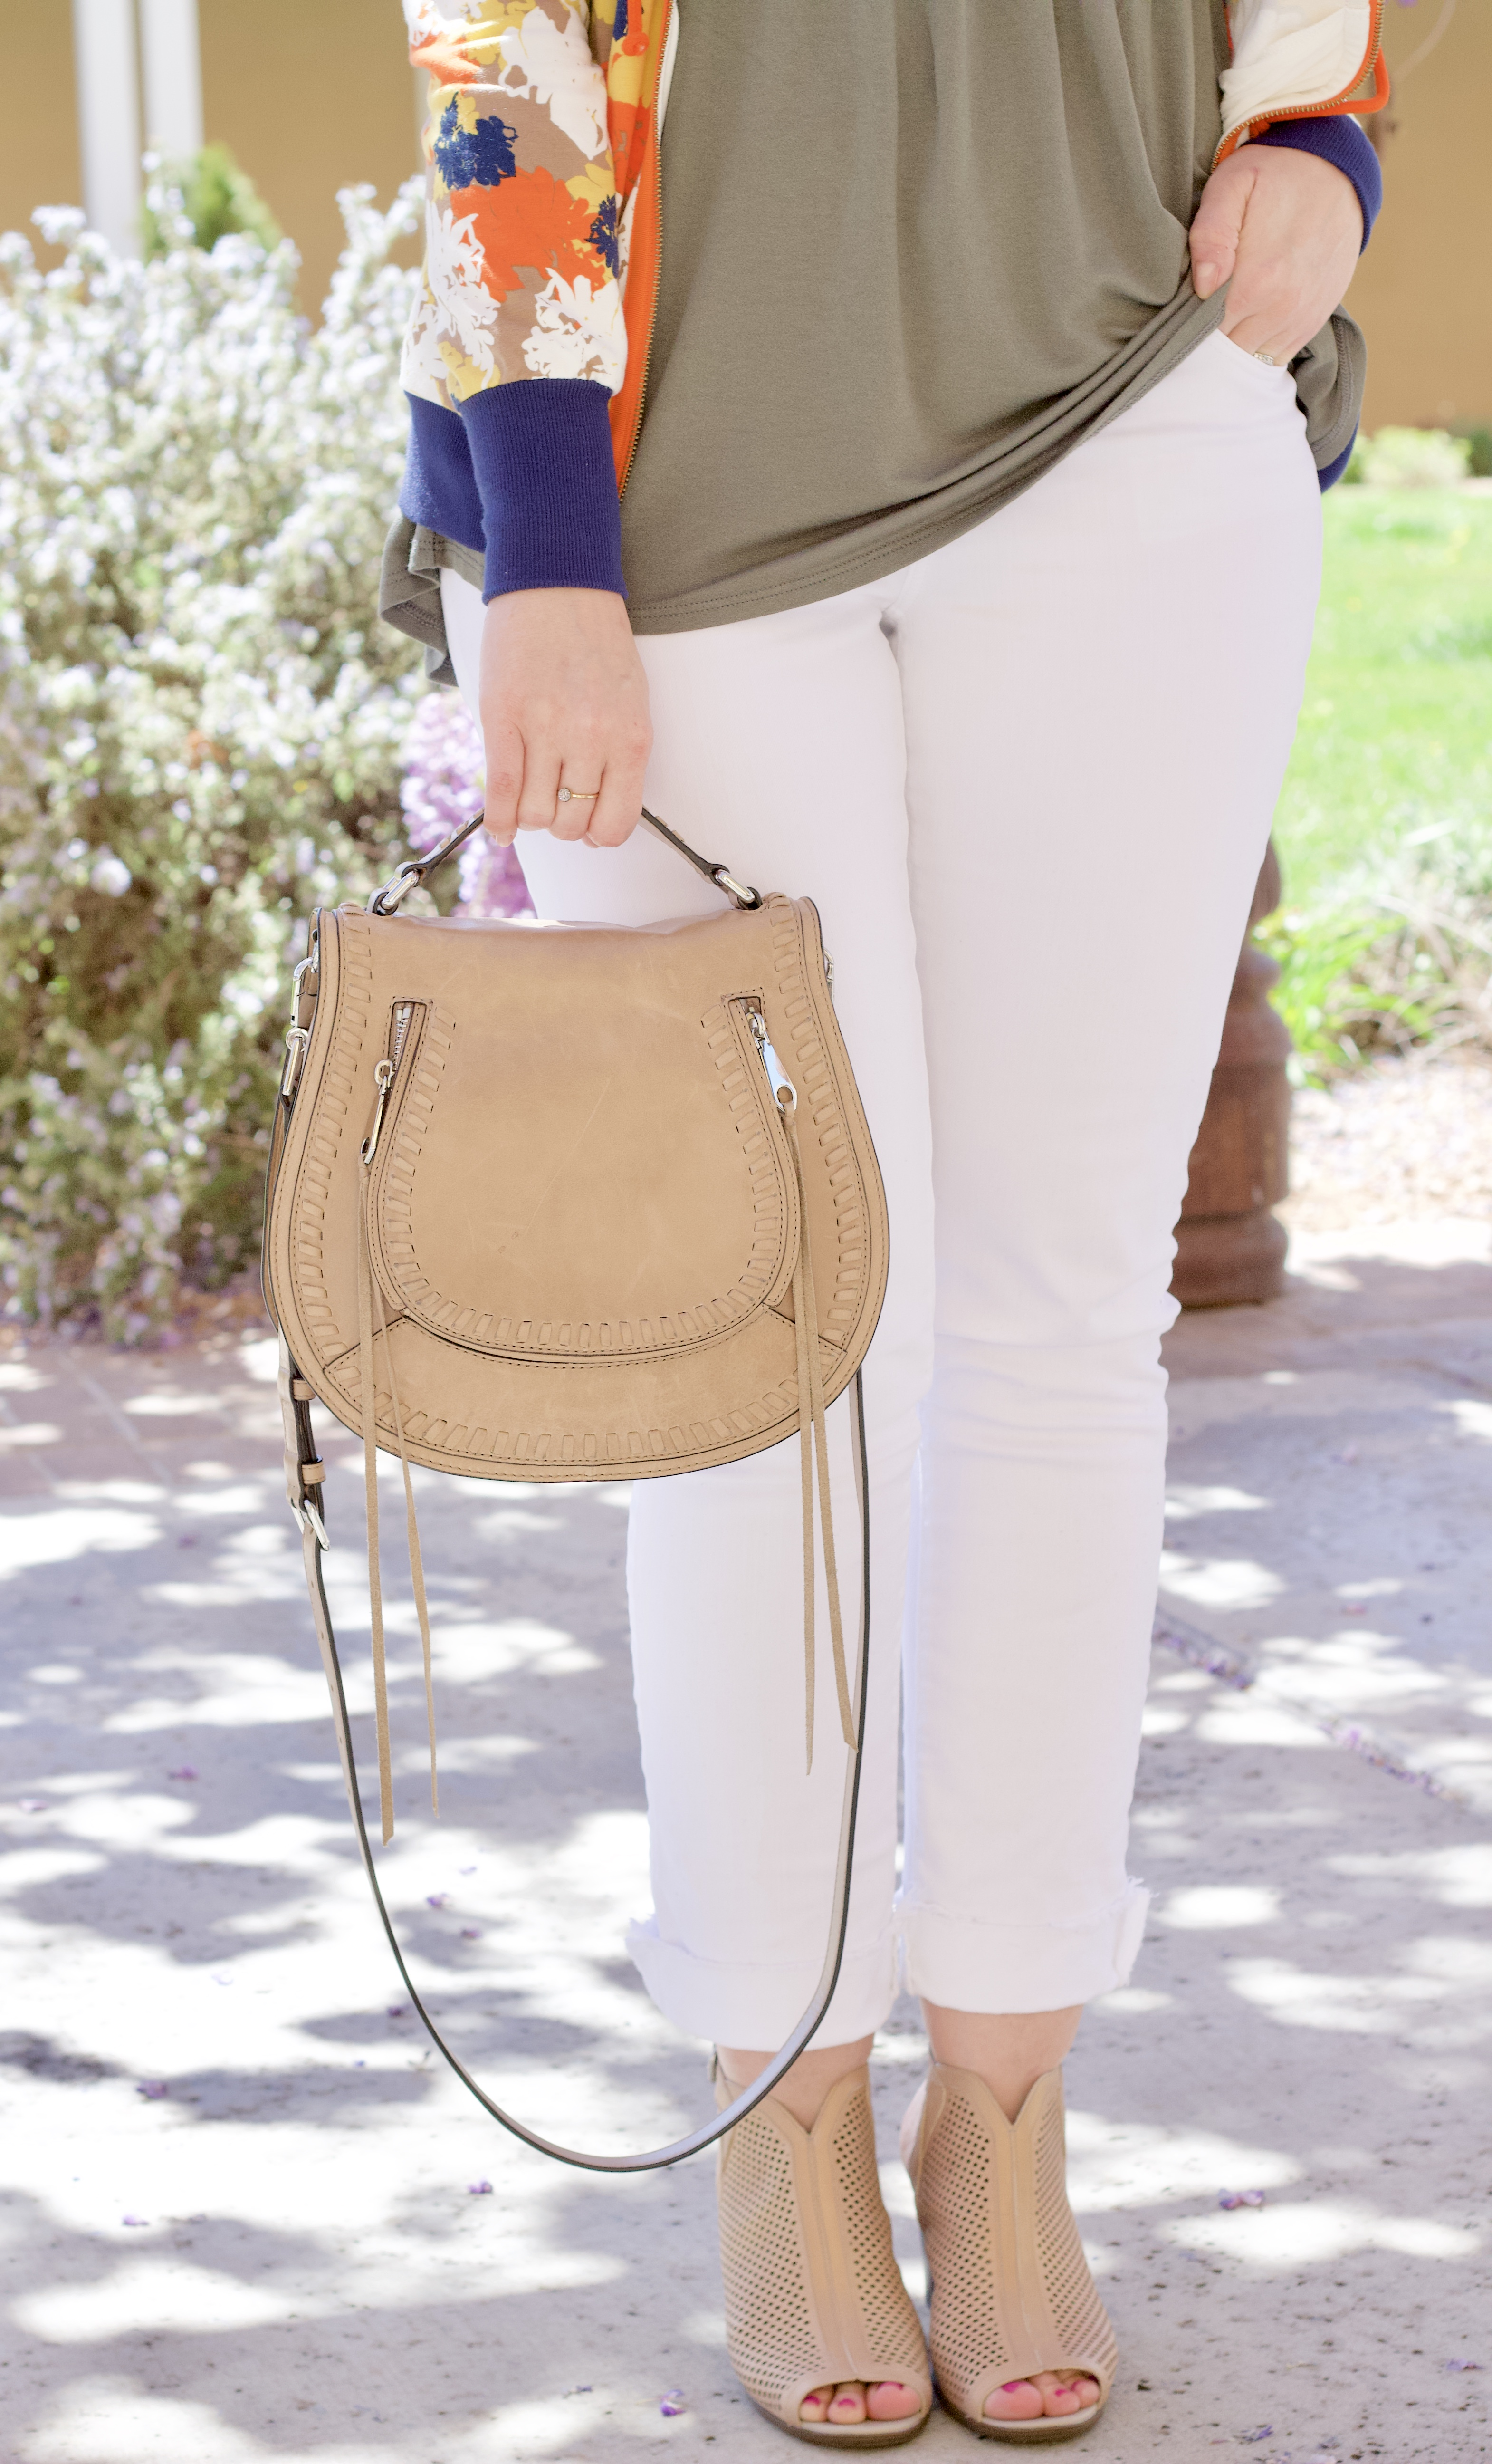 white jeans, rebecca minkoff vanity saddle bag #myRM #whitejeans #springfashion